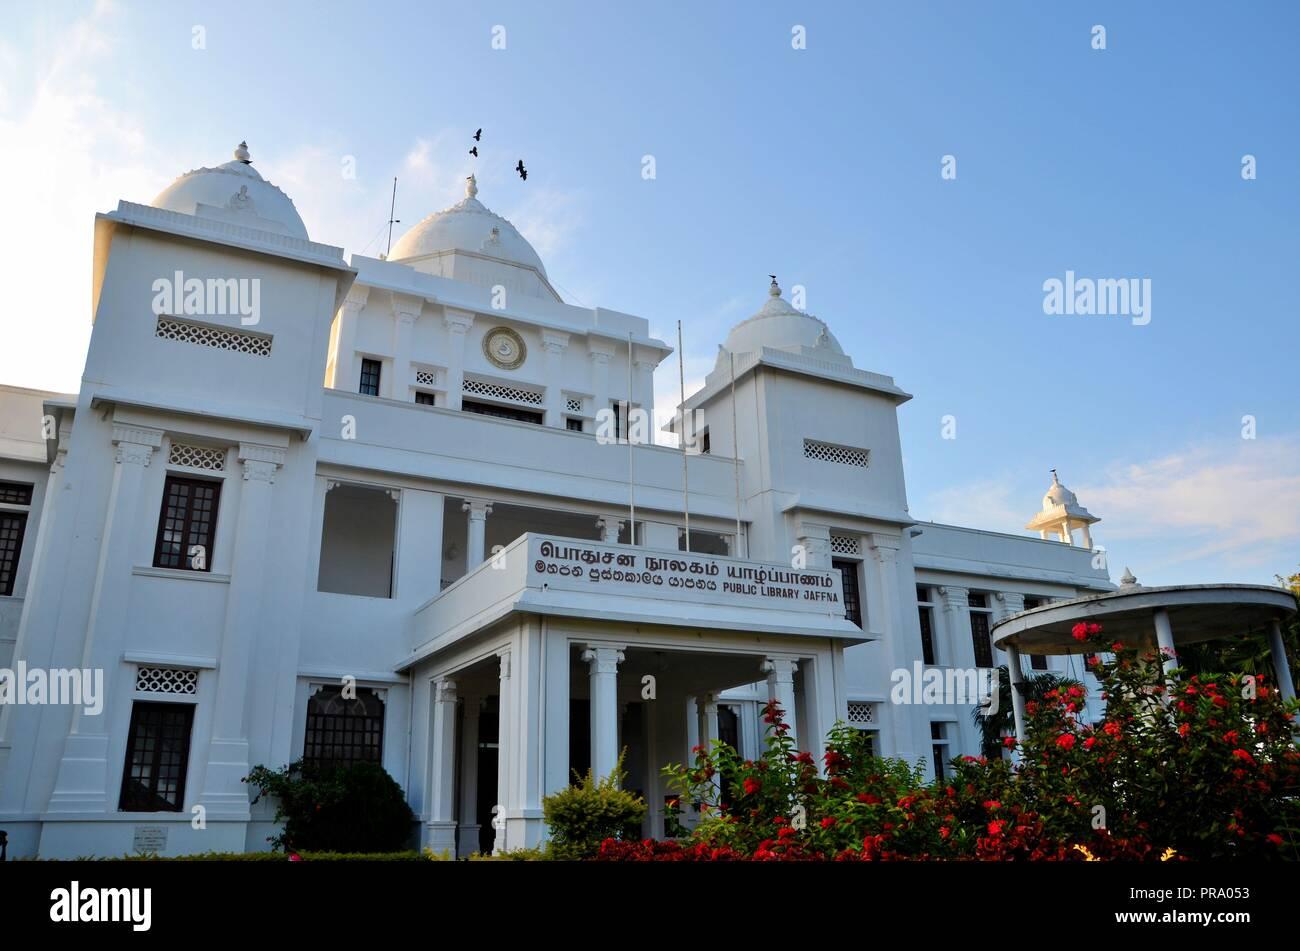 Colonial era rebuilt Jaffna Public Library landmark building for Tamils Jaffna Sri Lanka - Stock Image